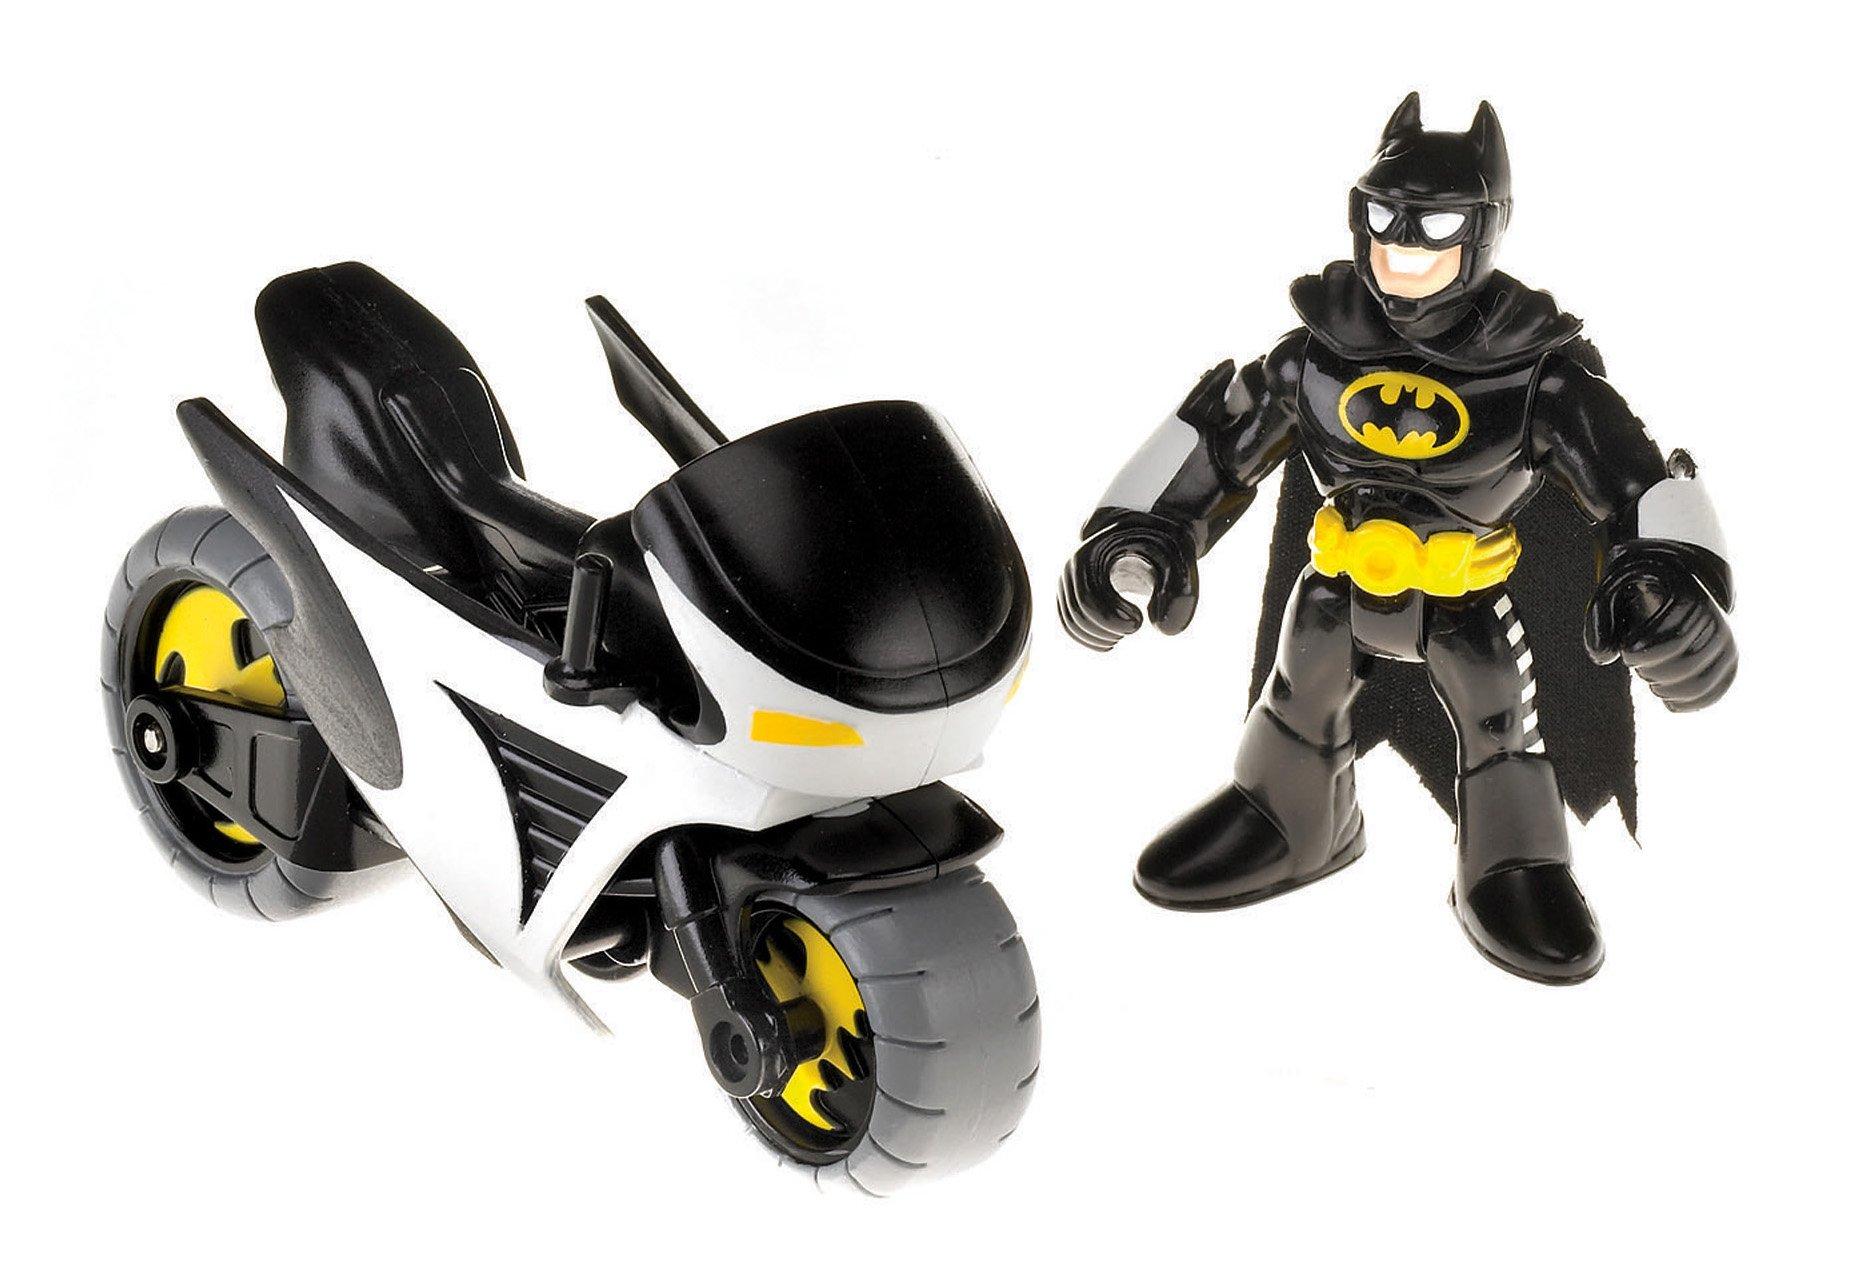 Fisher-Price Imaginext DC Super Friends Batman and Batcycle